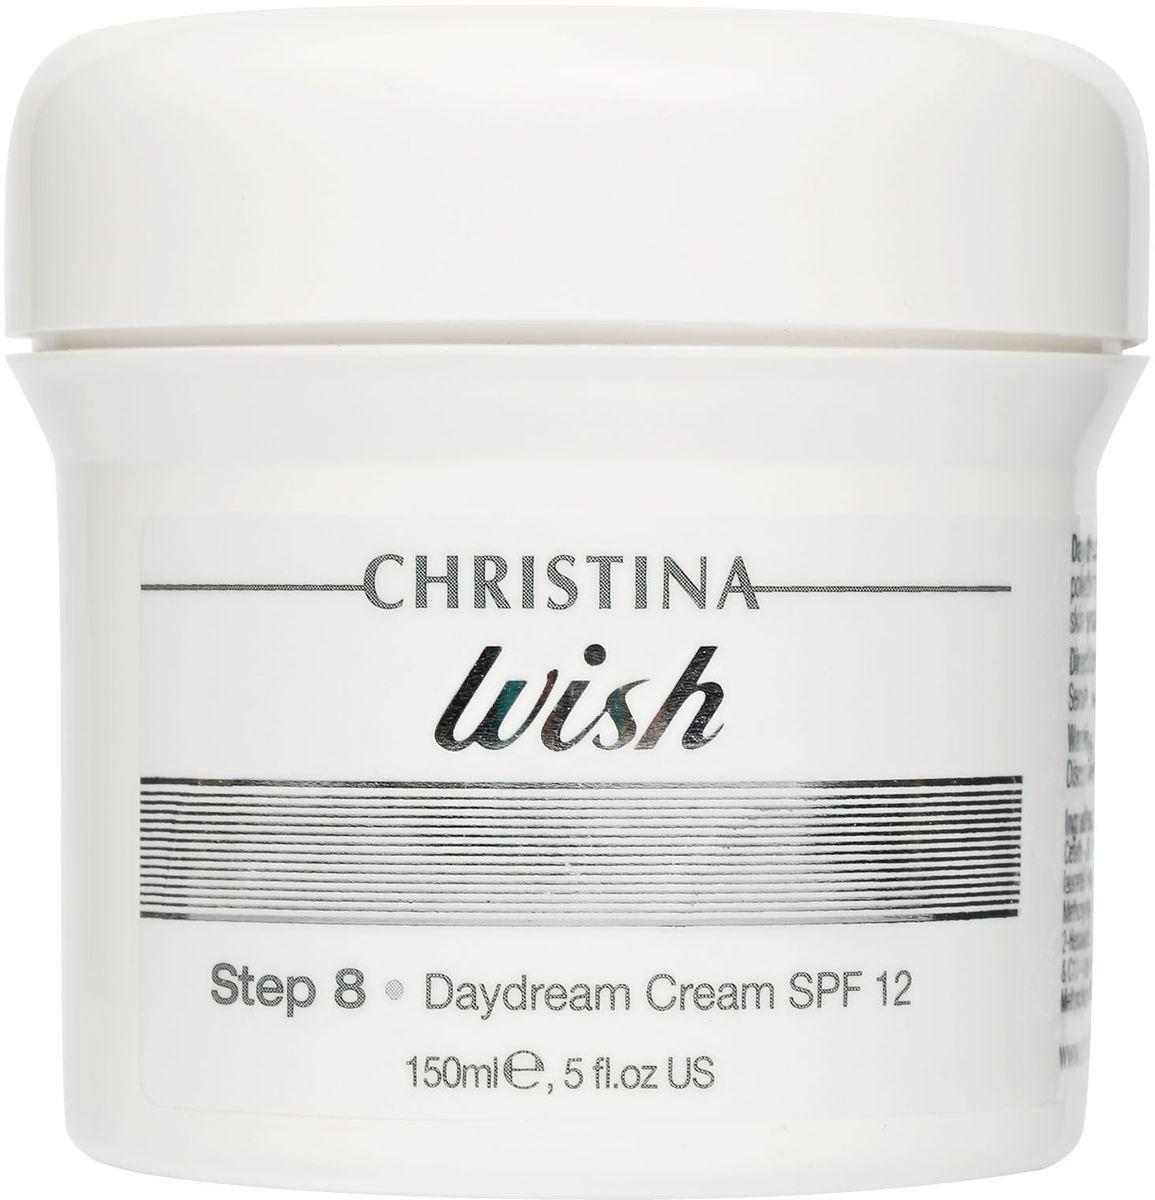 Christina Wish Wish Day Cream SPF12 - Дневной крем SPF12 для лица 50 мл